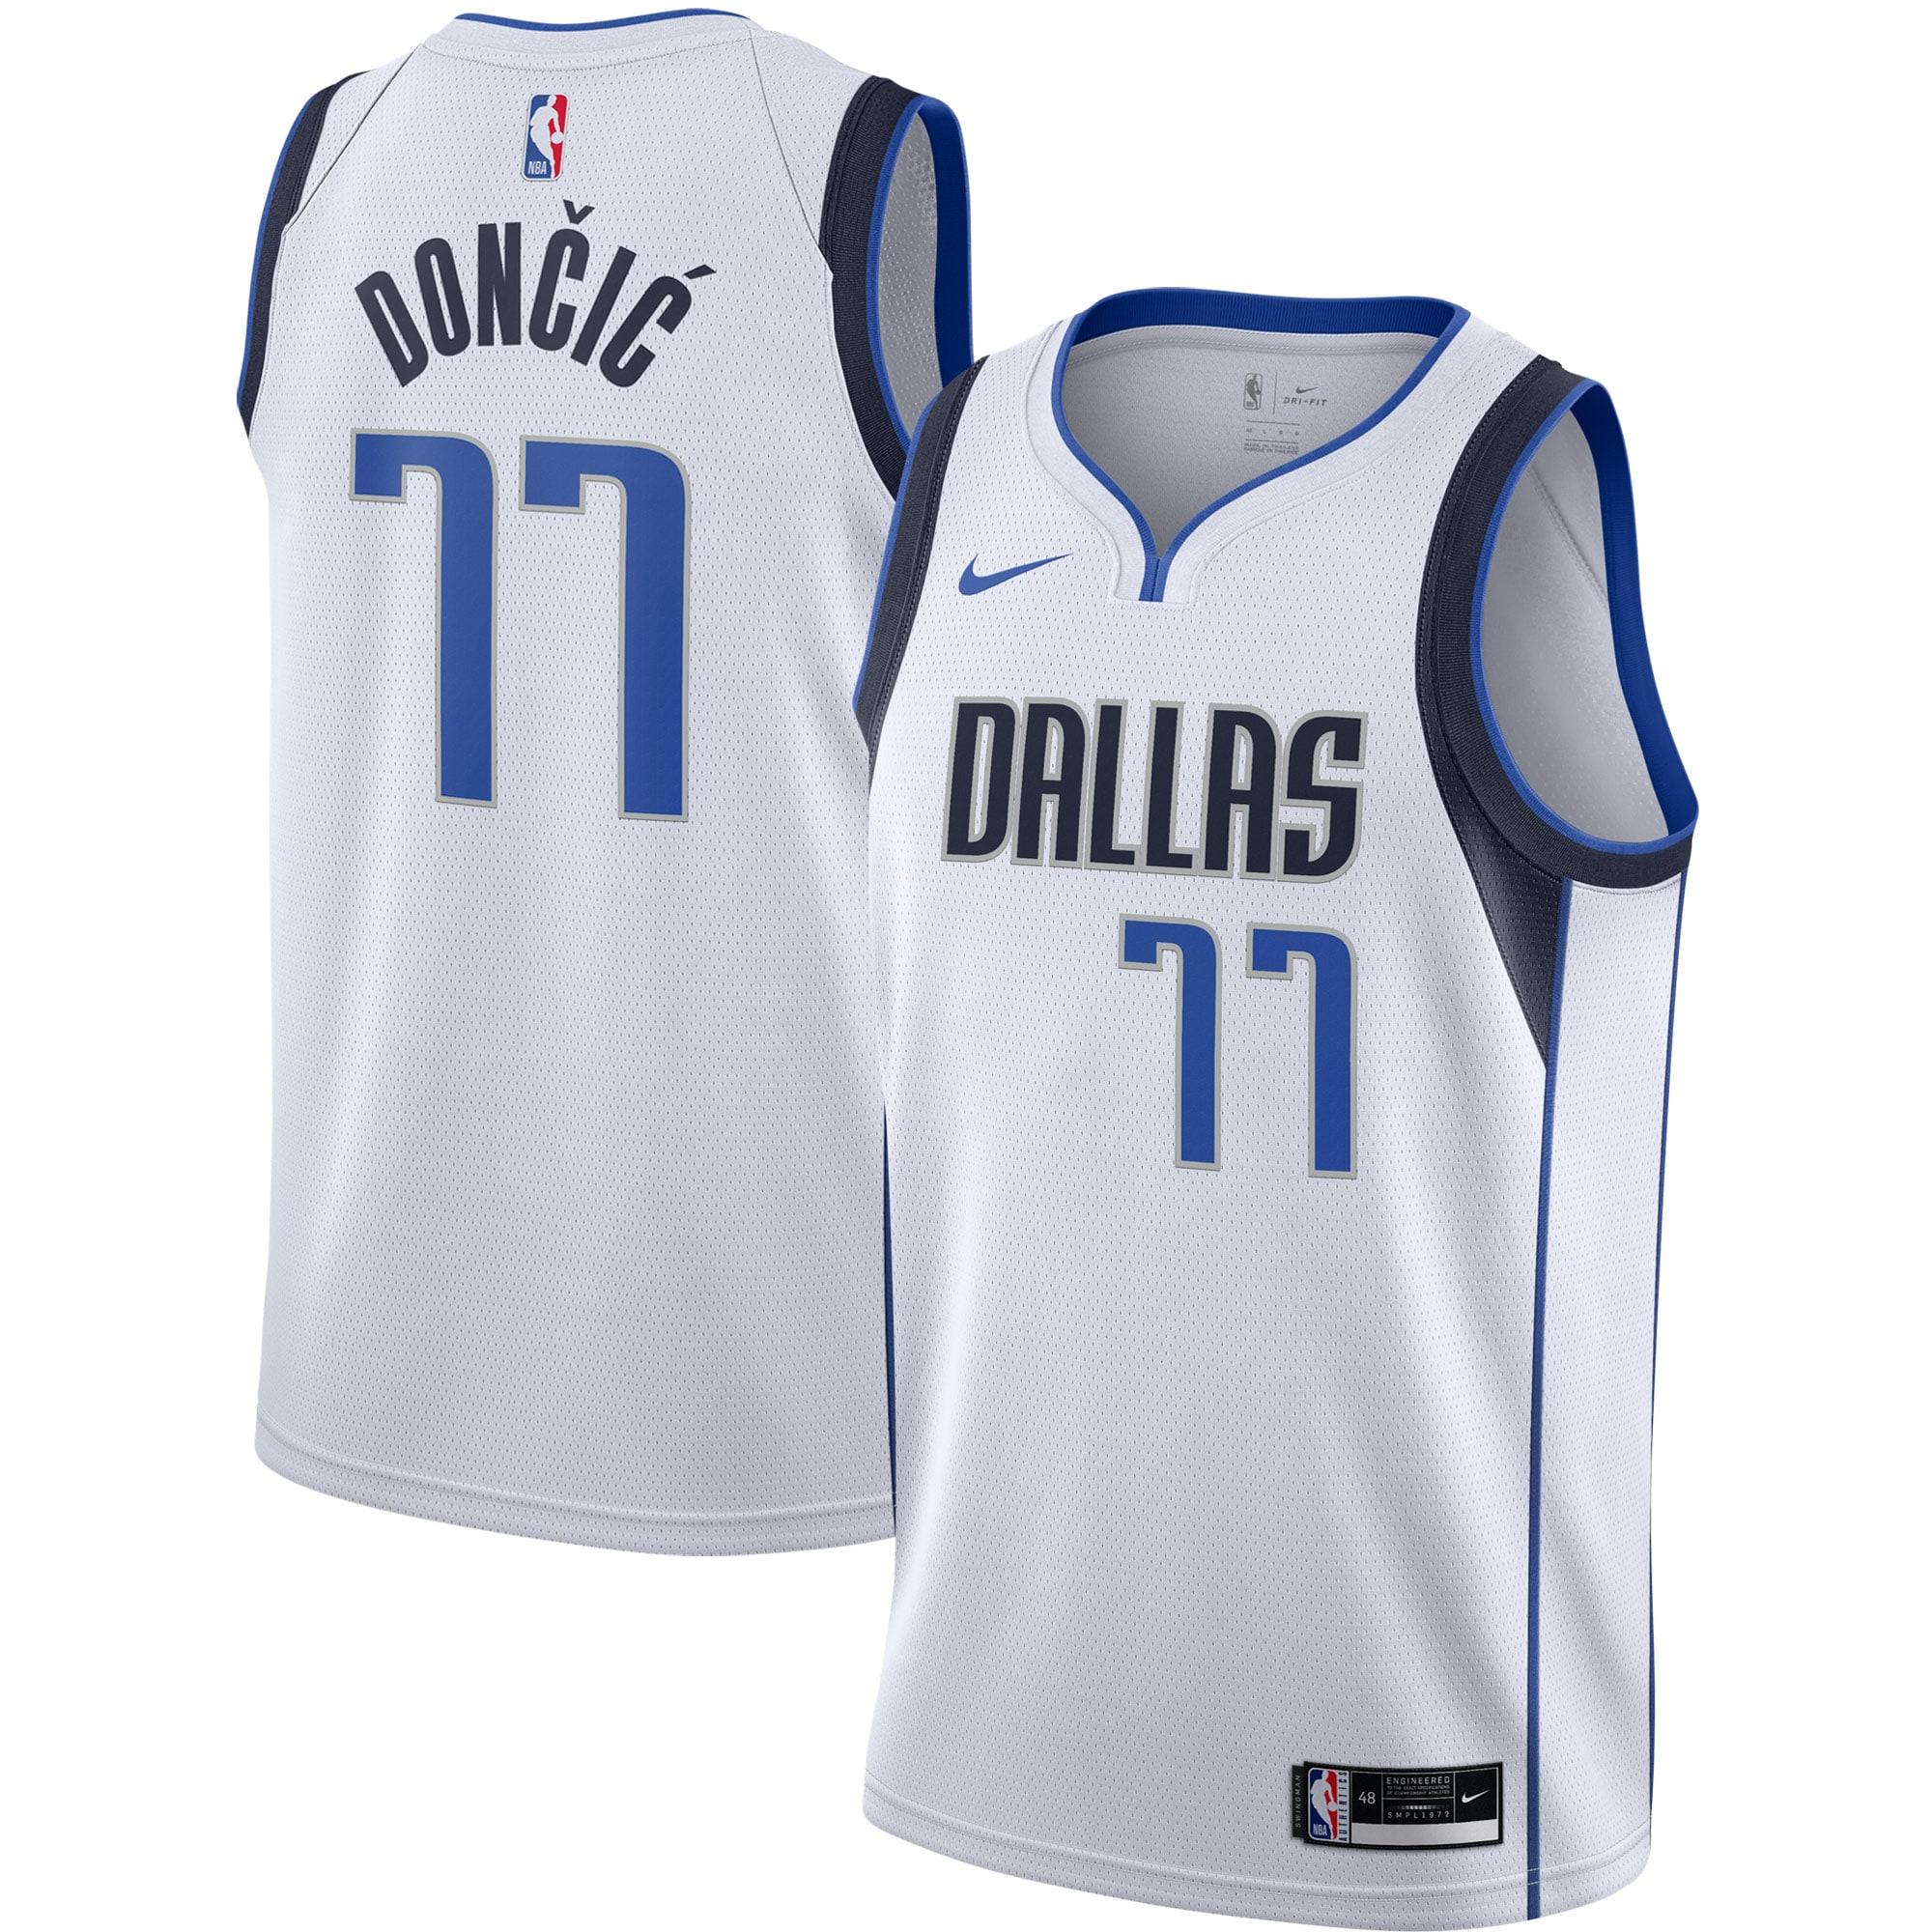 Luka Doncic Dallas Mavericks Nike 2020/21 Swingman Jersey - White - Association Edition